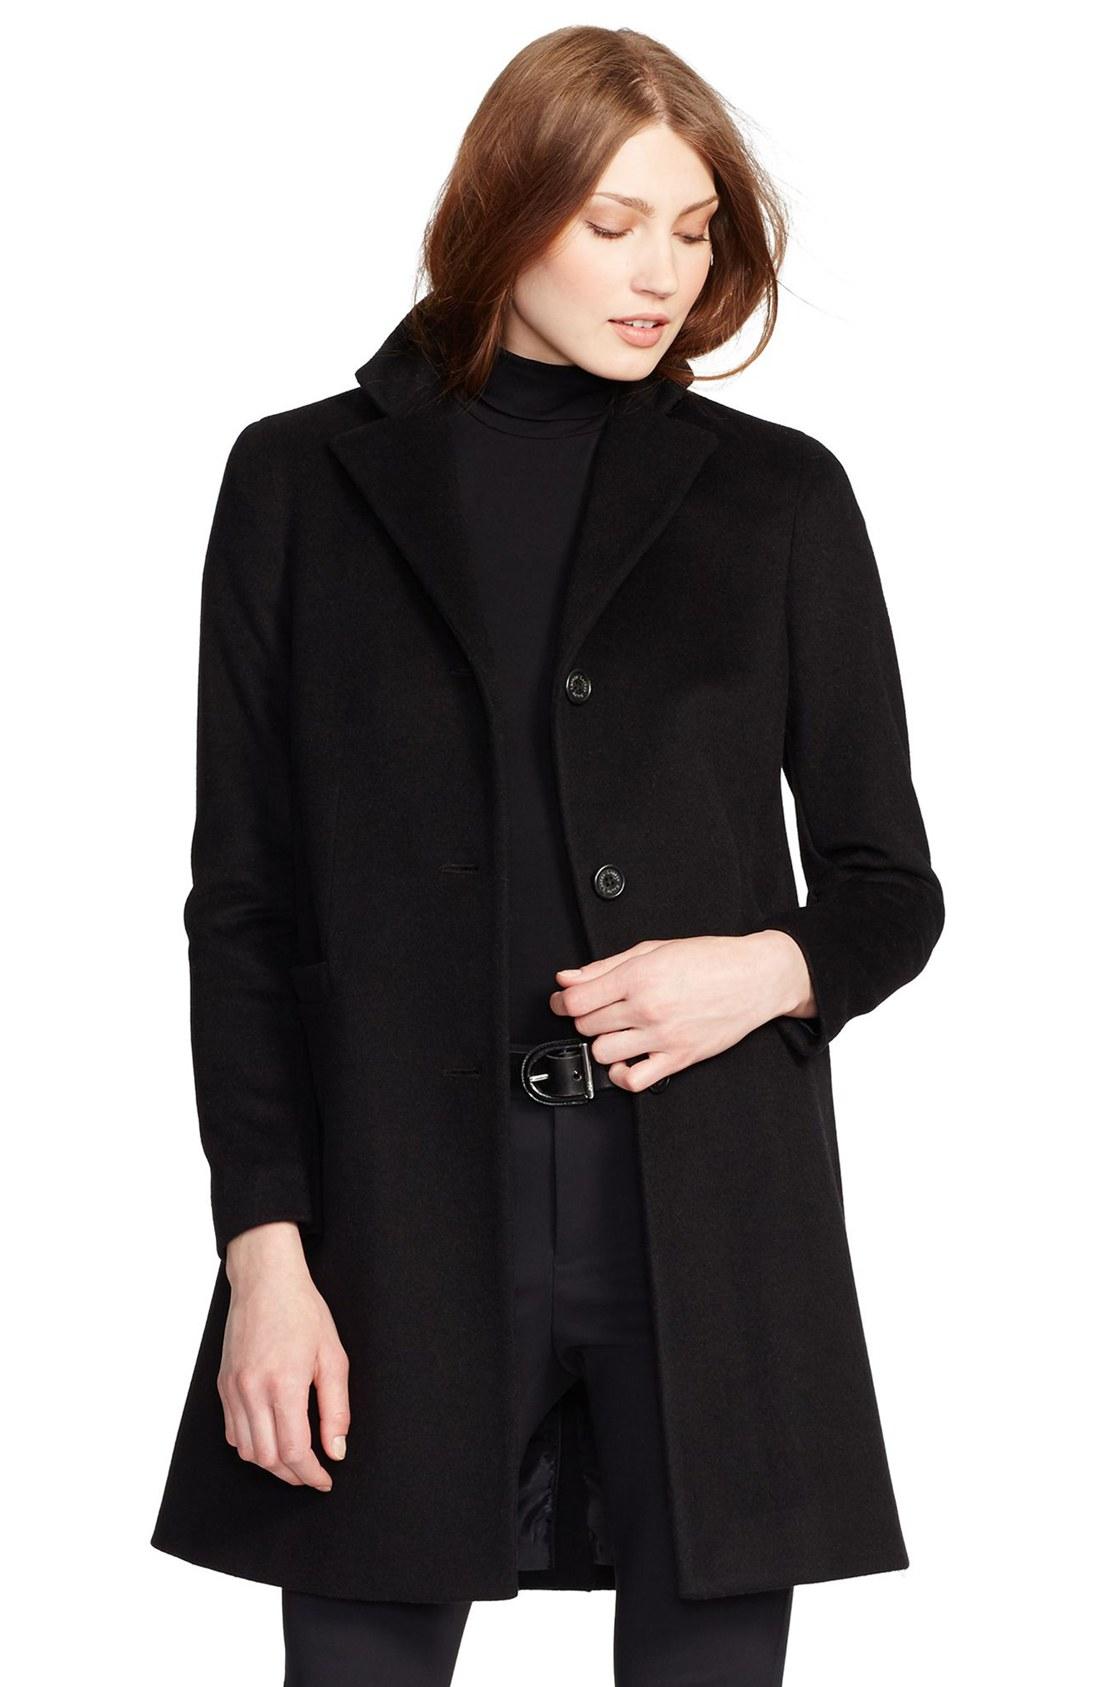 Coat for petite women